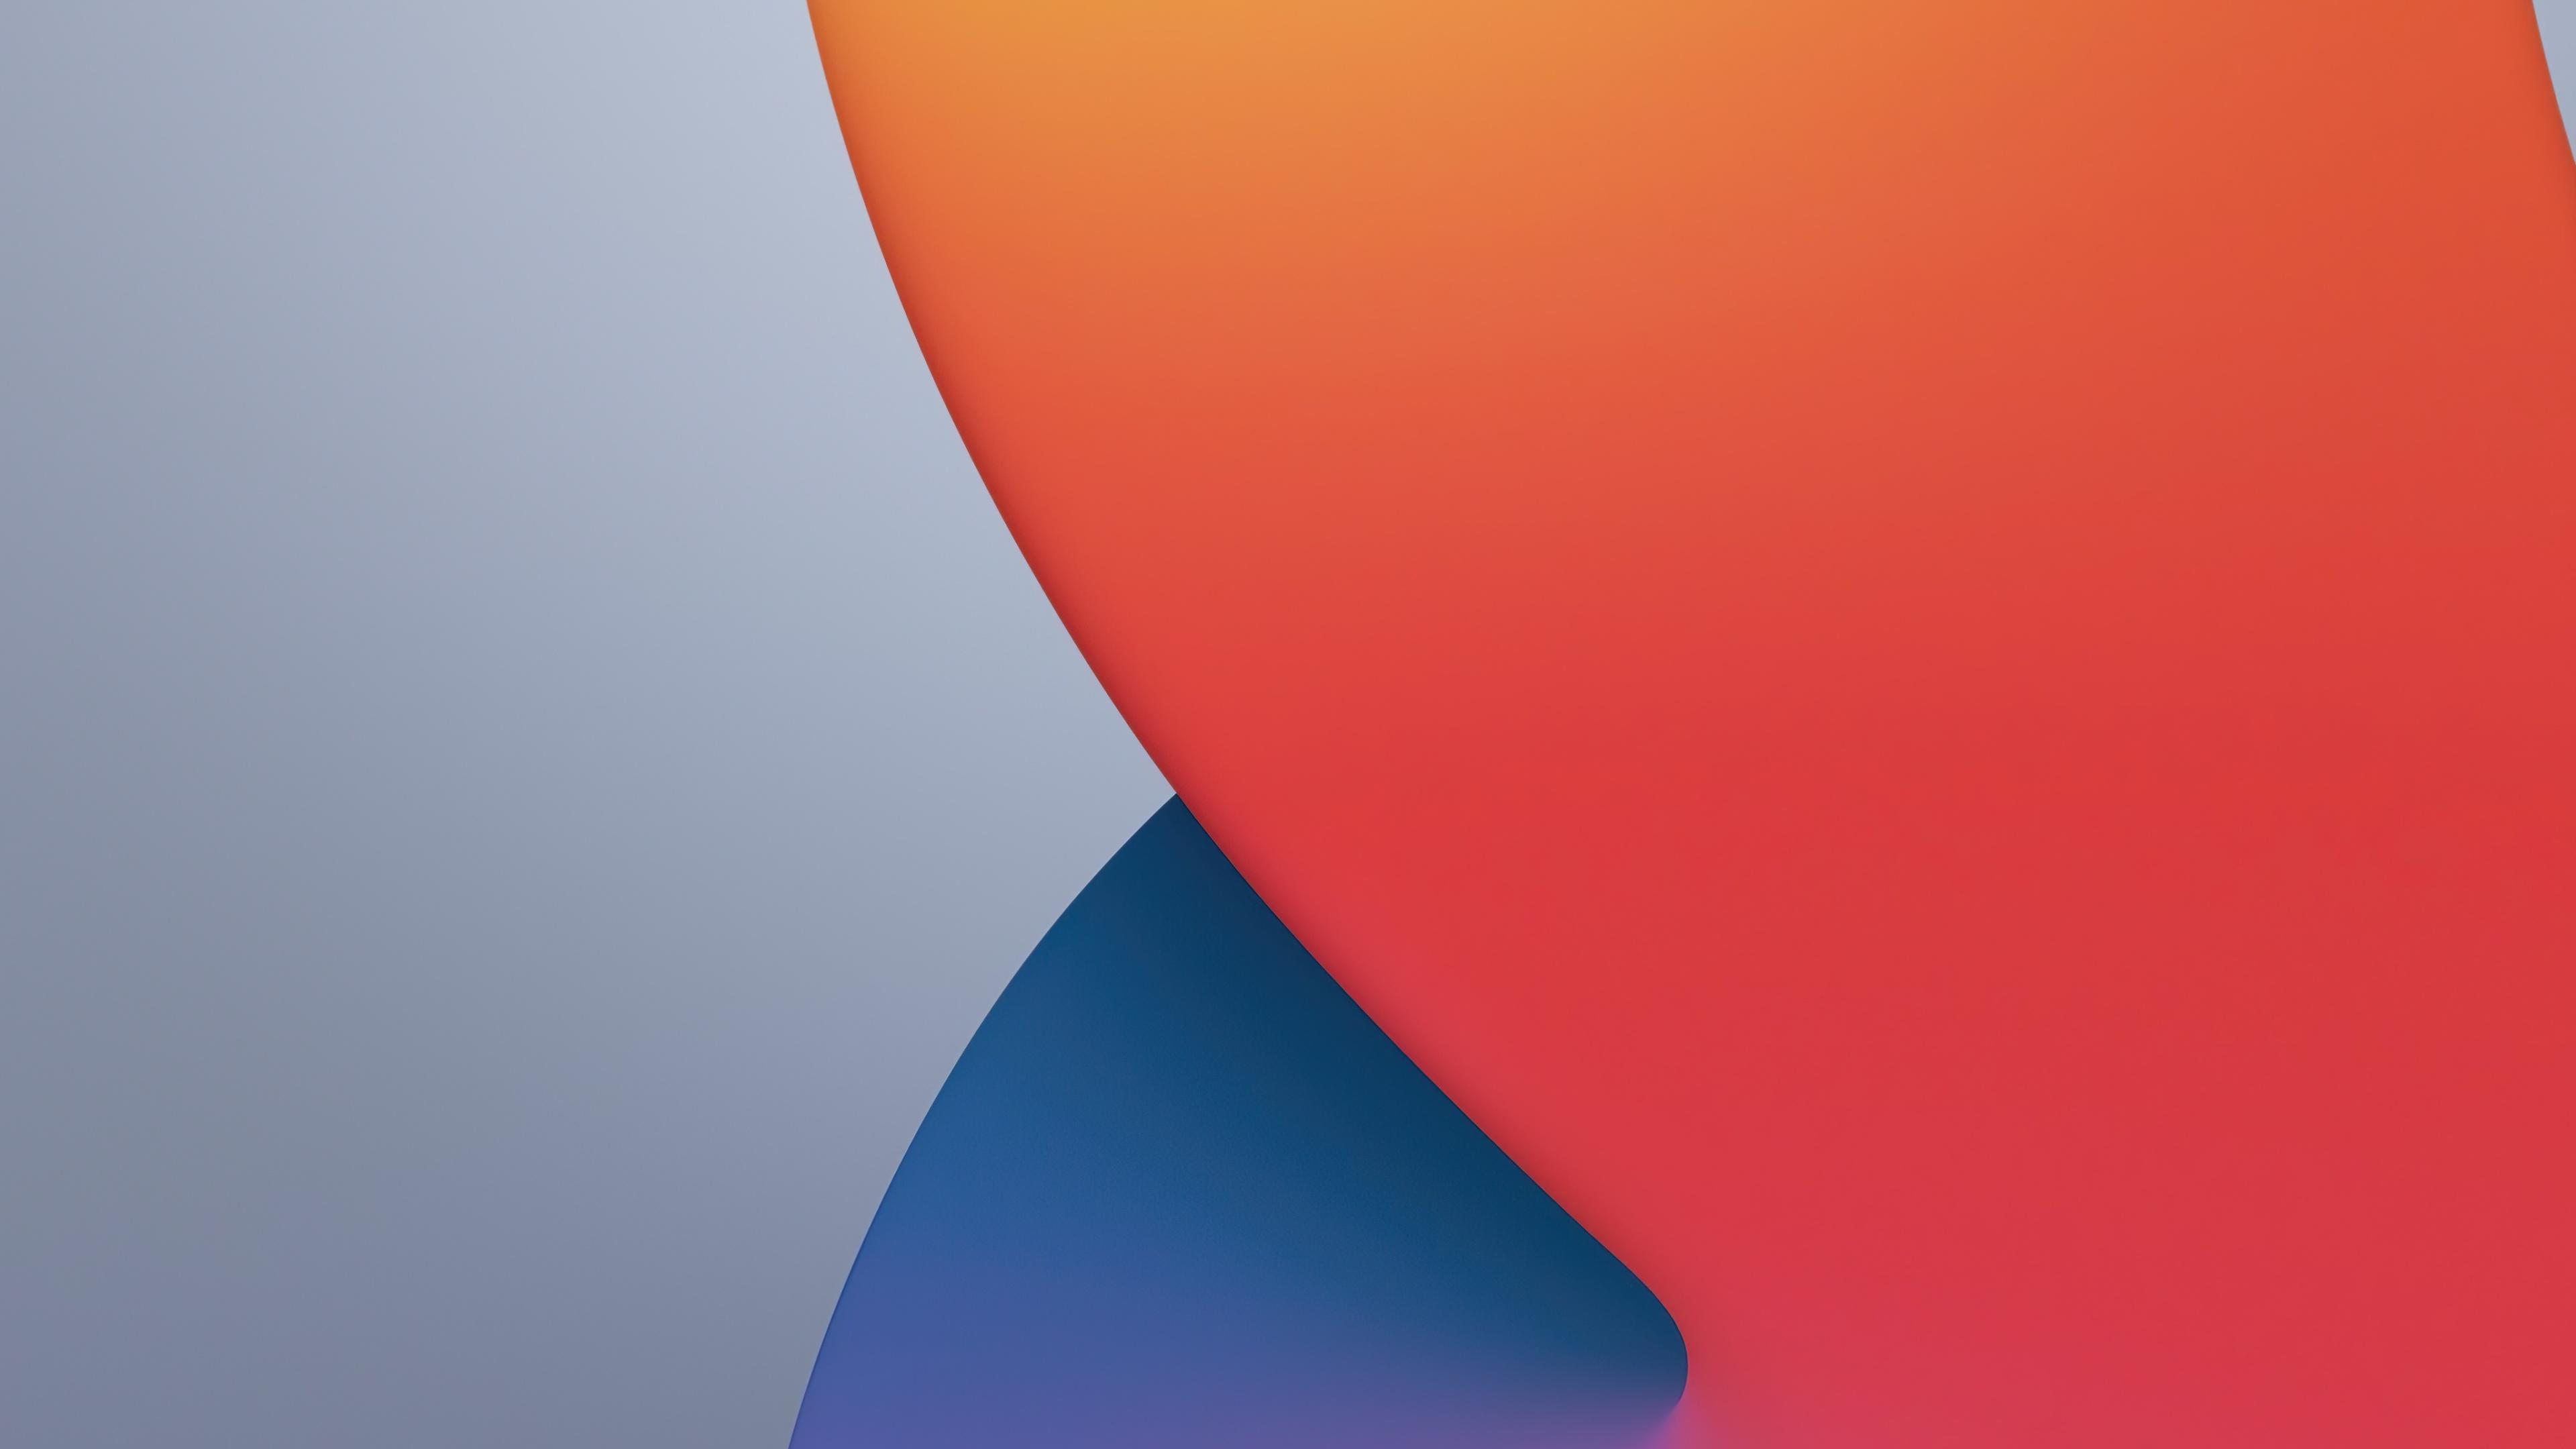 Ios 14 4k Wallpaper Wwdc 2020 Iphone 12 Ipados Stock Gradients 1433